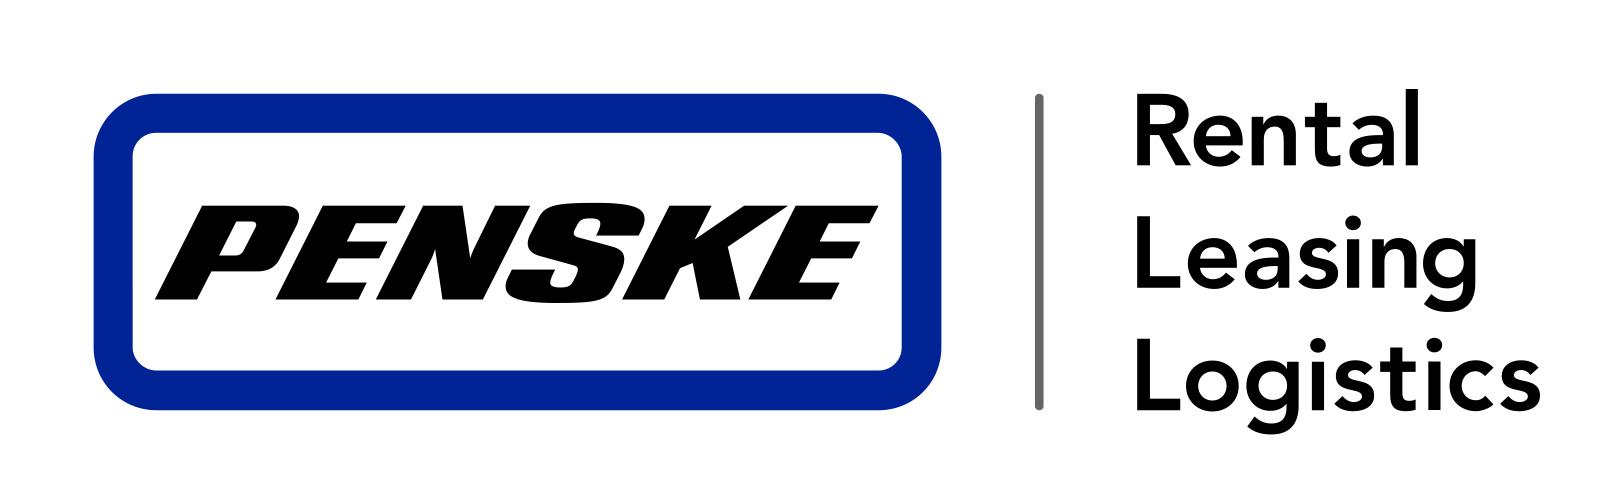 Find And Apply Penske Truck Leasing Trucking Jobs